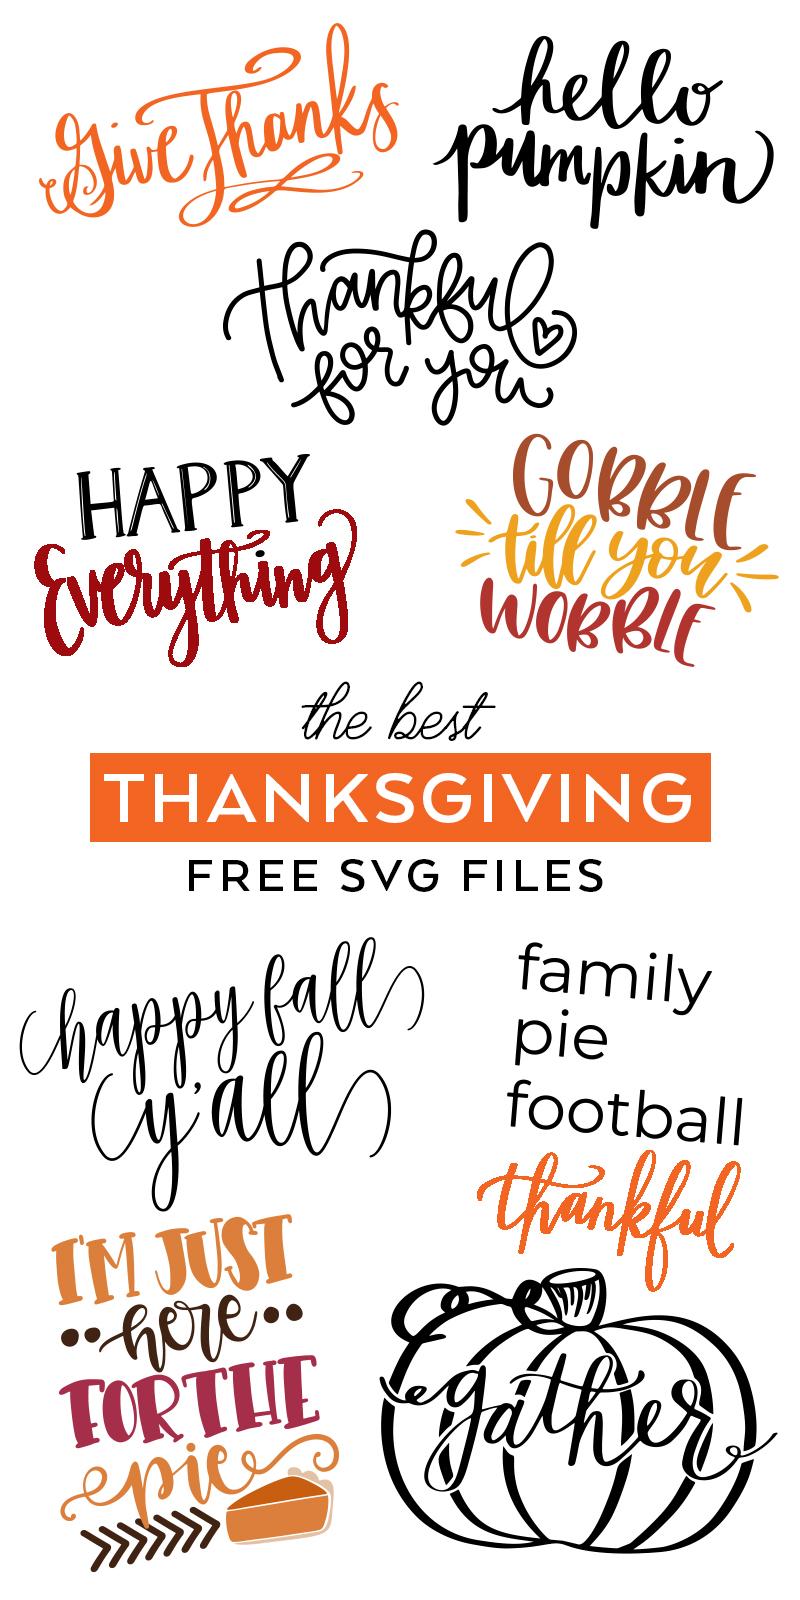 Free Thanksgiving SVG Files - SVG Cut Files - Pineapple ...